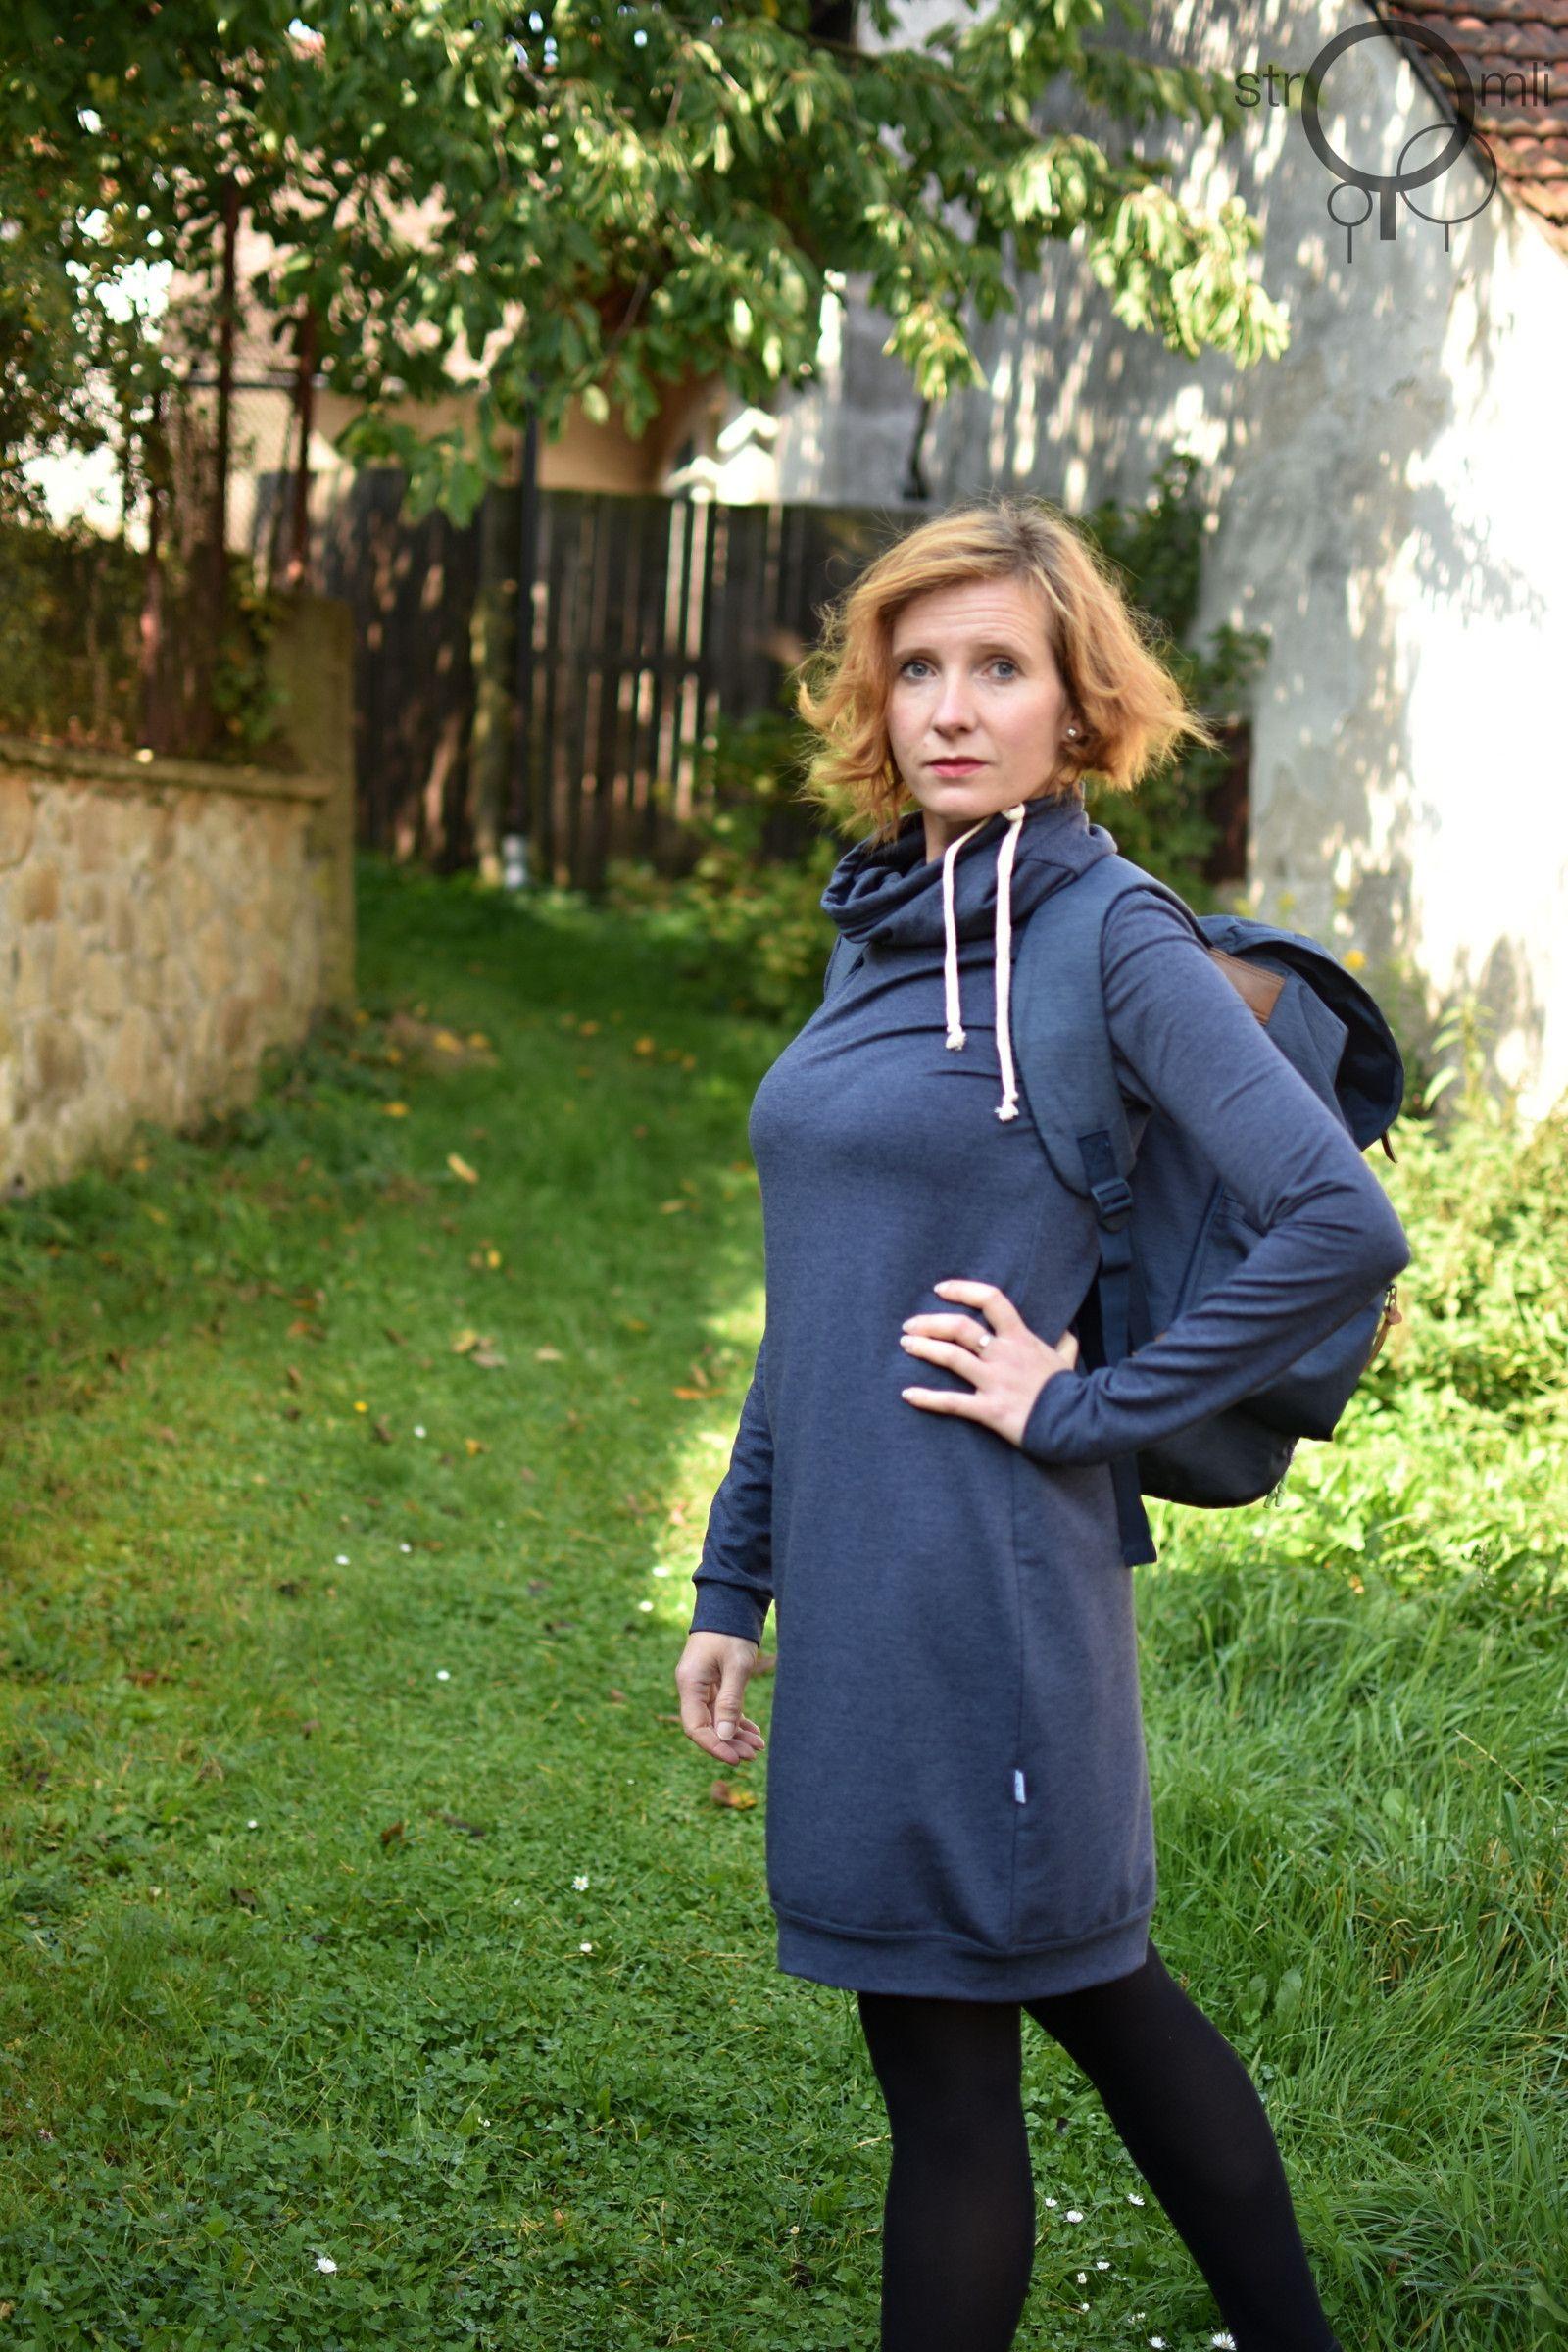 Šaty+teploučké+modré+s+melírem ad98310fb0